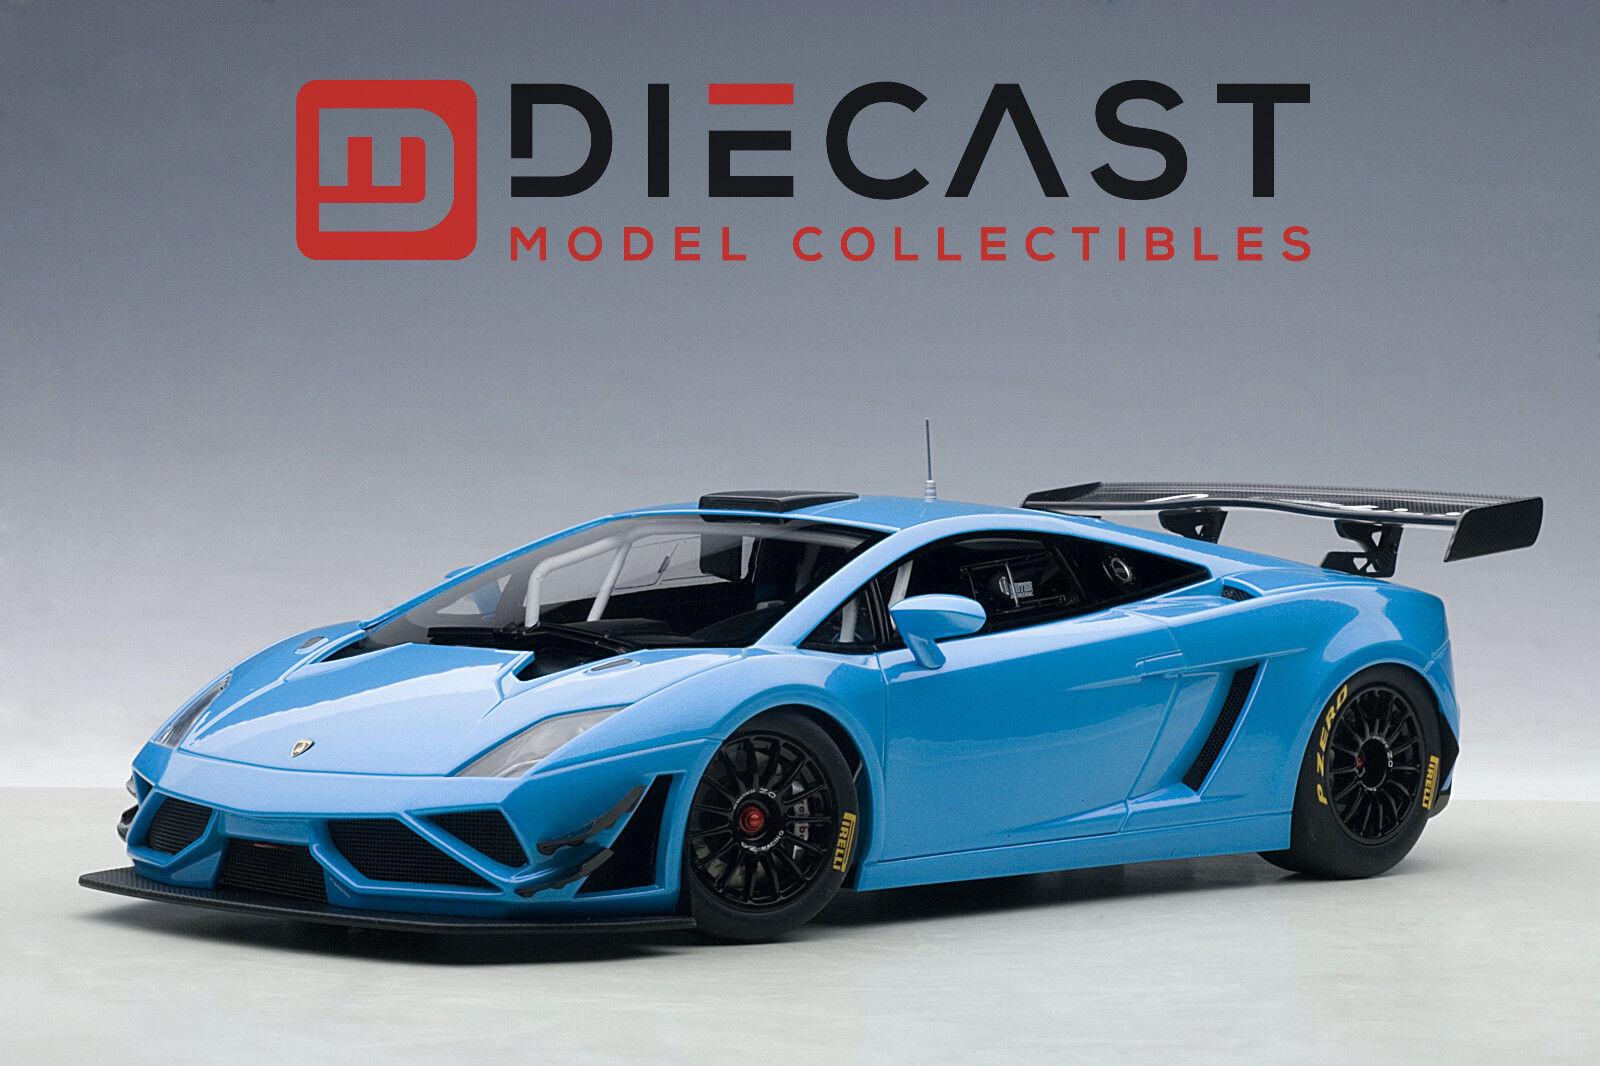 AUTOART 81359 LAMBORGHINI GALLARDO GT3 FL2 2013, blueE, 1 18TH SCALE